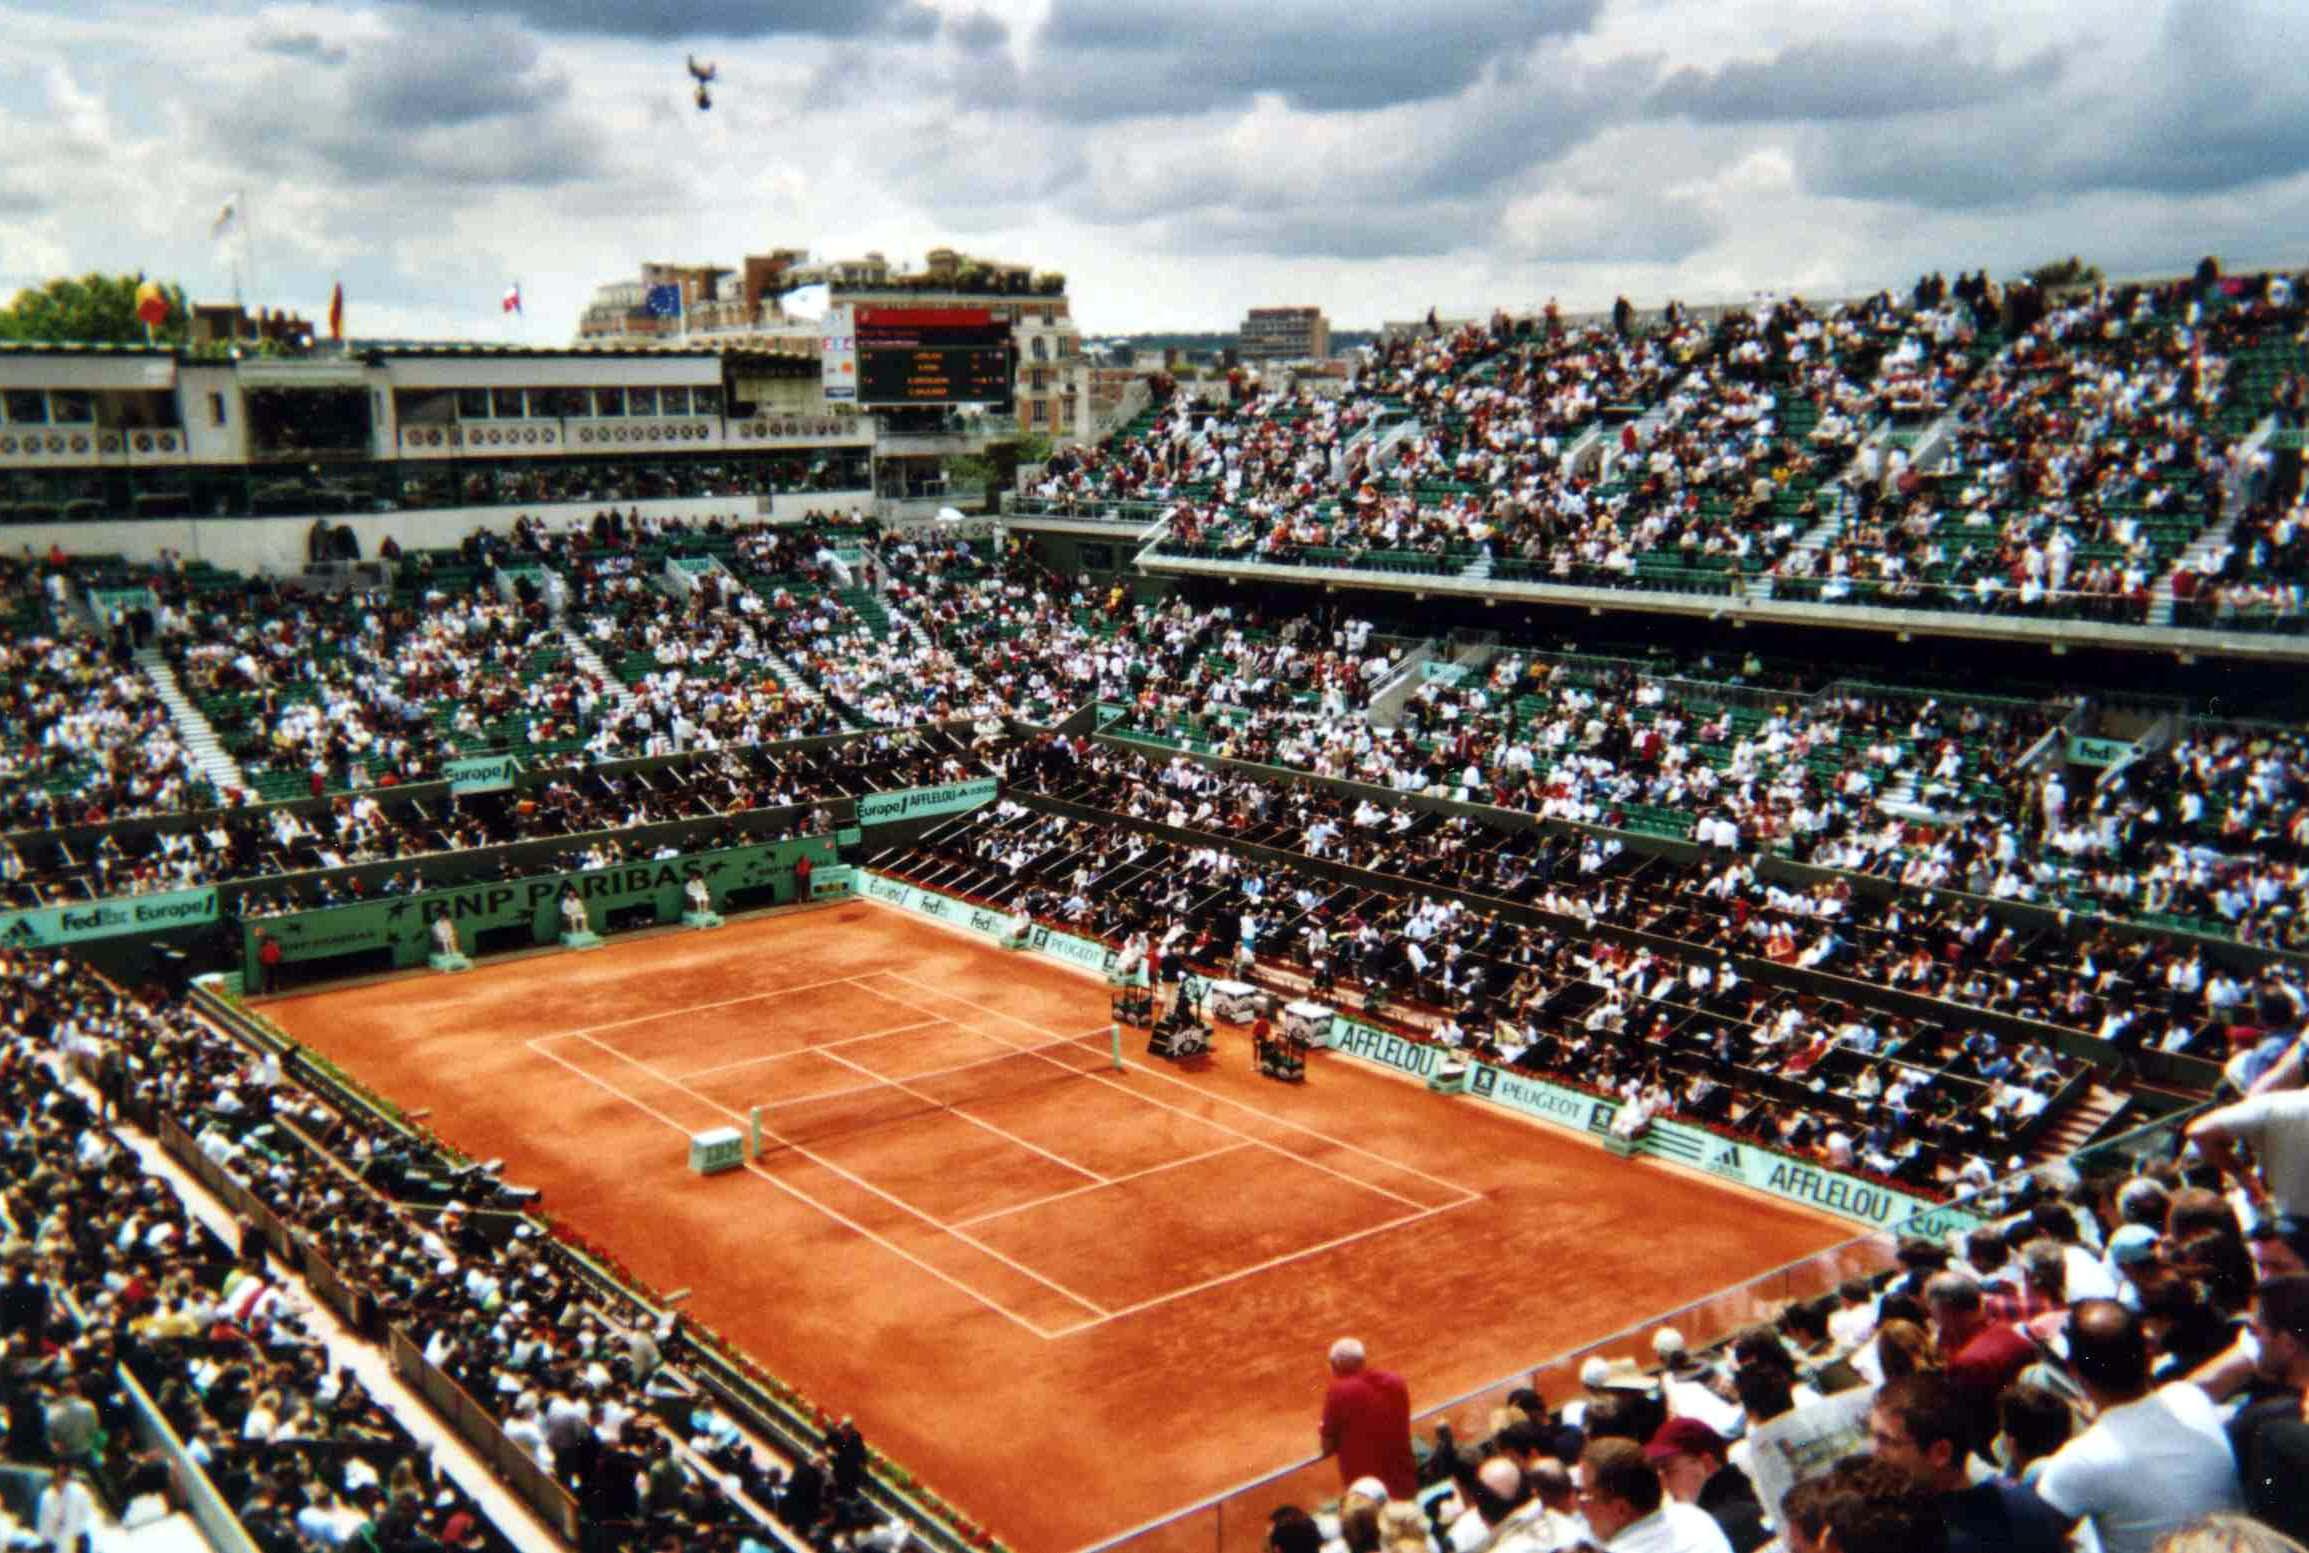 Roland Garros Central